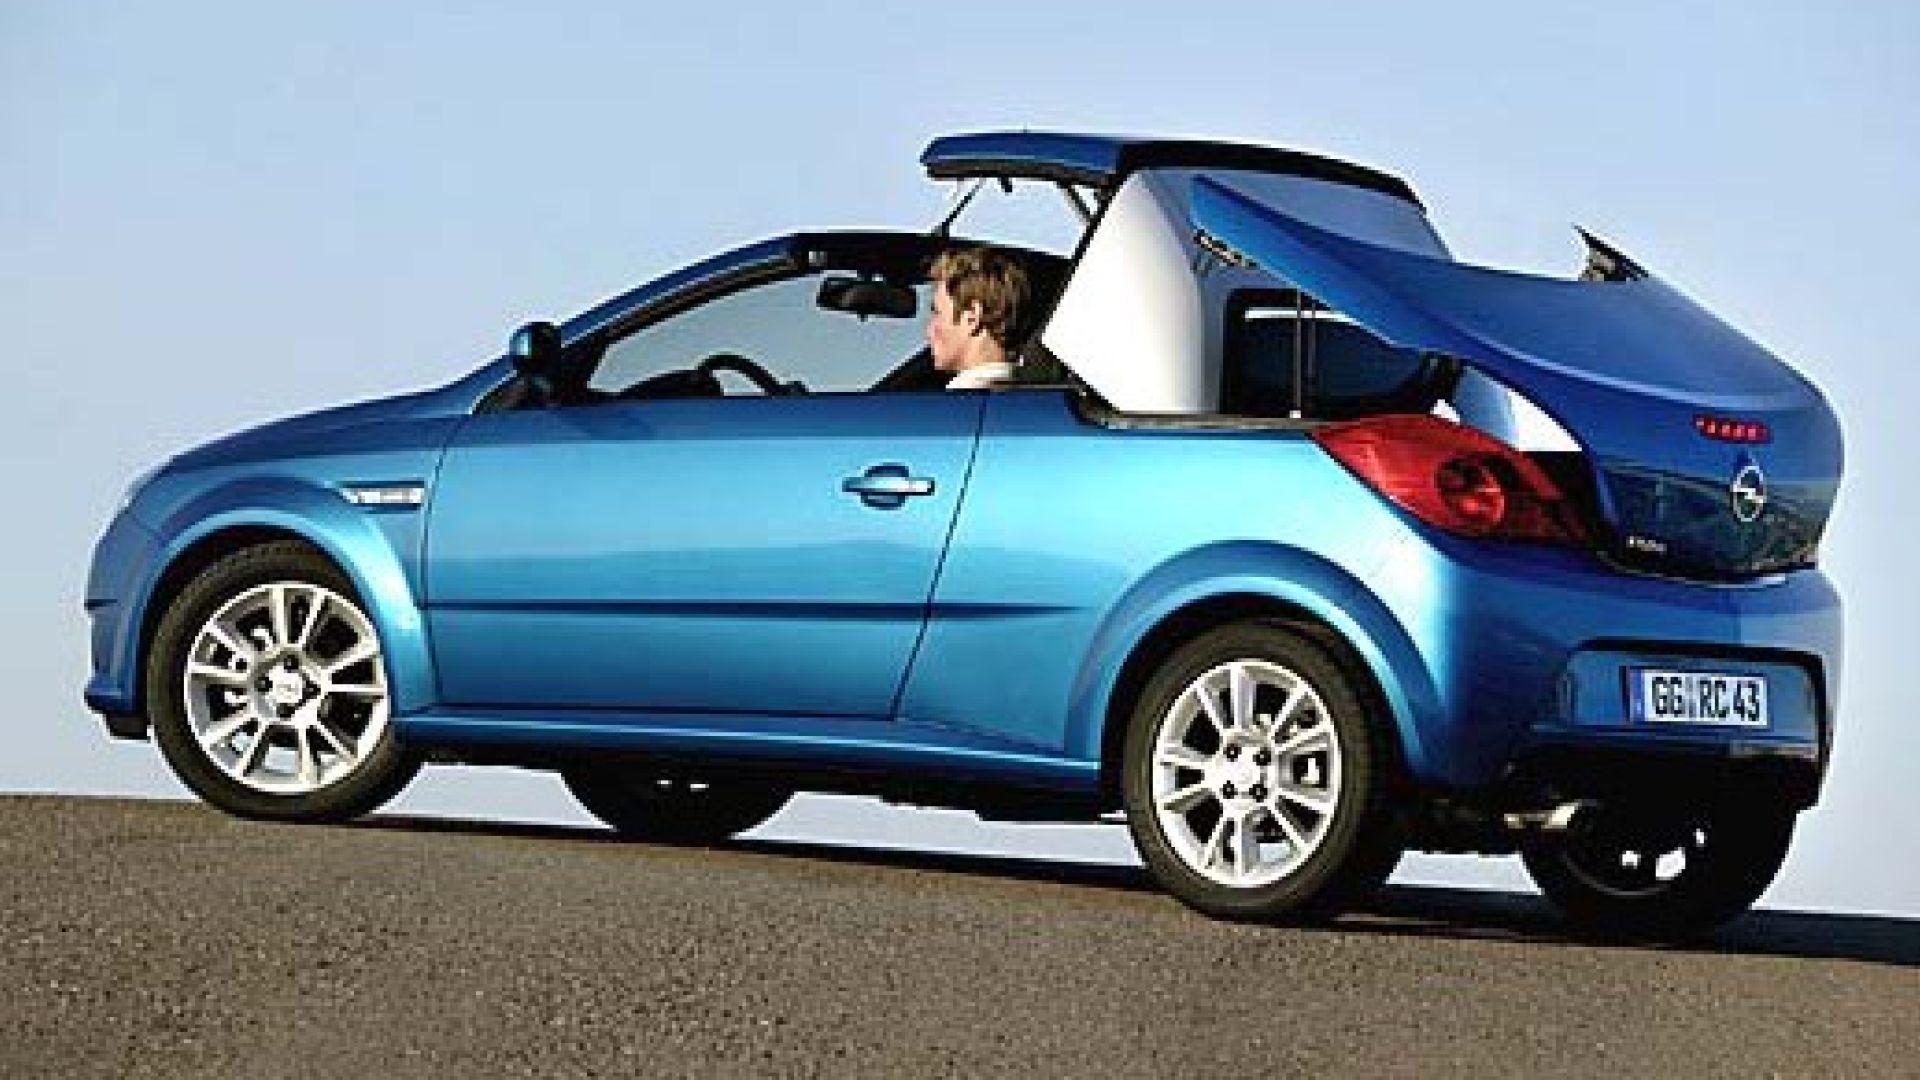 Anteprima  Opel Tigra Twintop